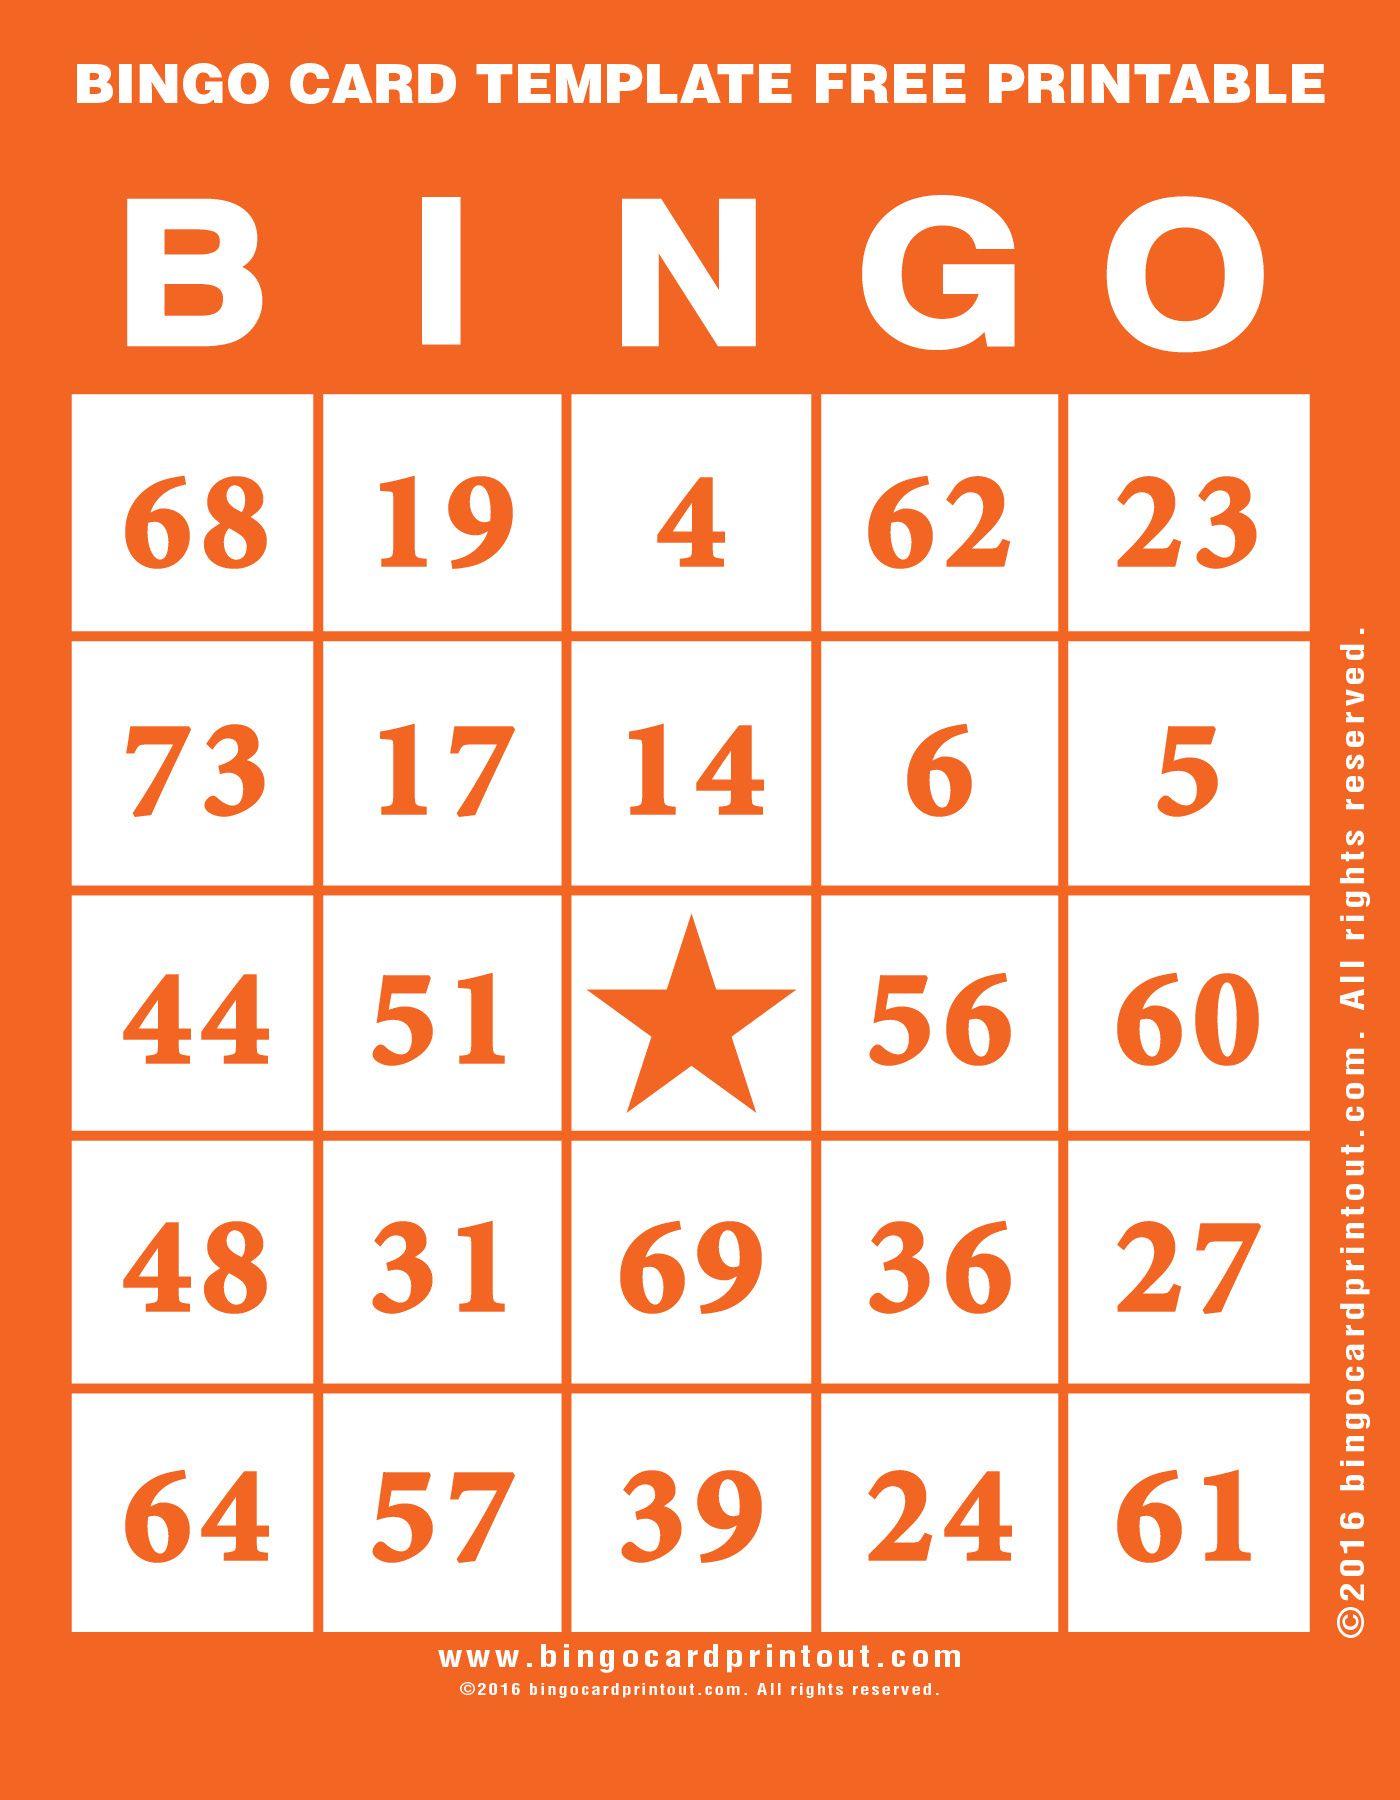 Bingo Card Template Free Printable   Bingo    Bingo